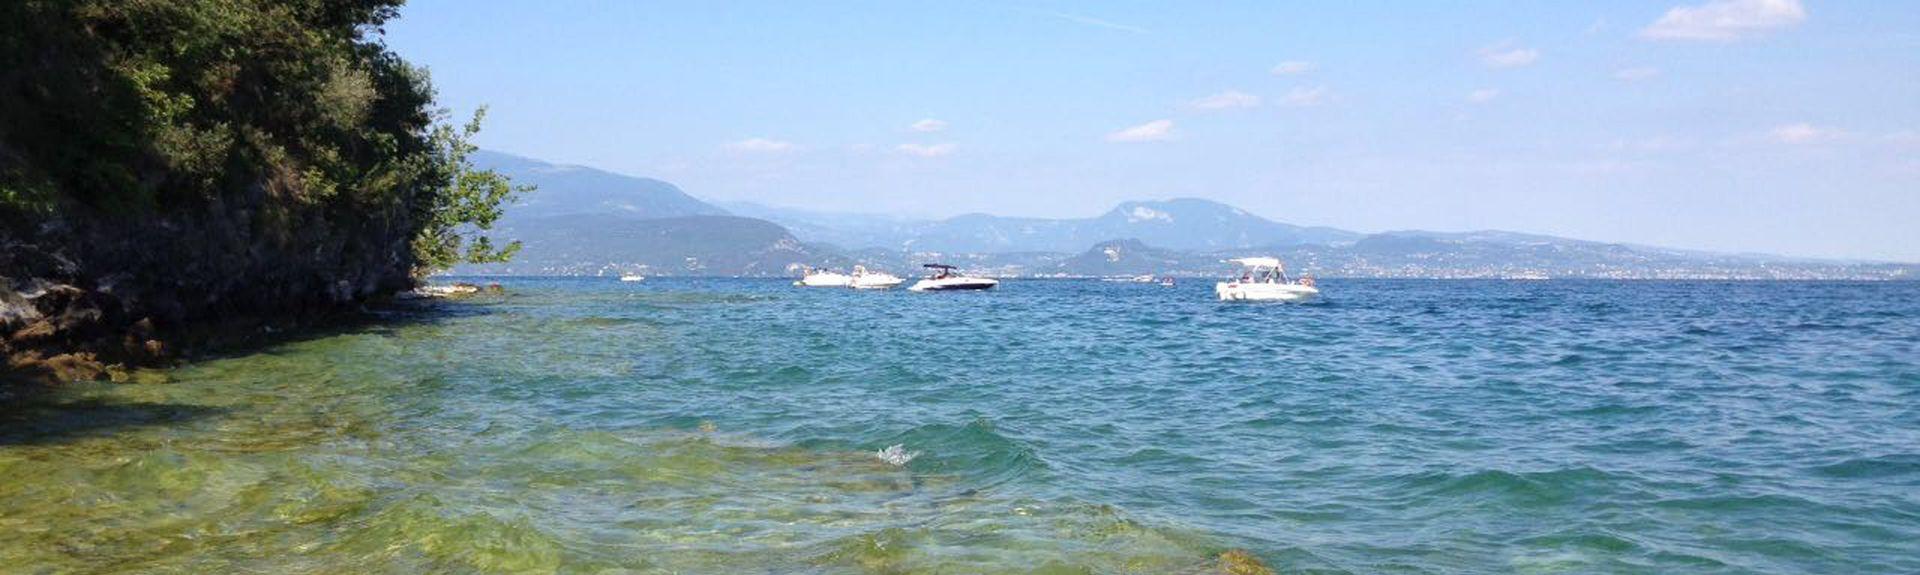 Soiano del Lago, Lombardie, Italie